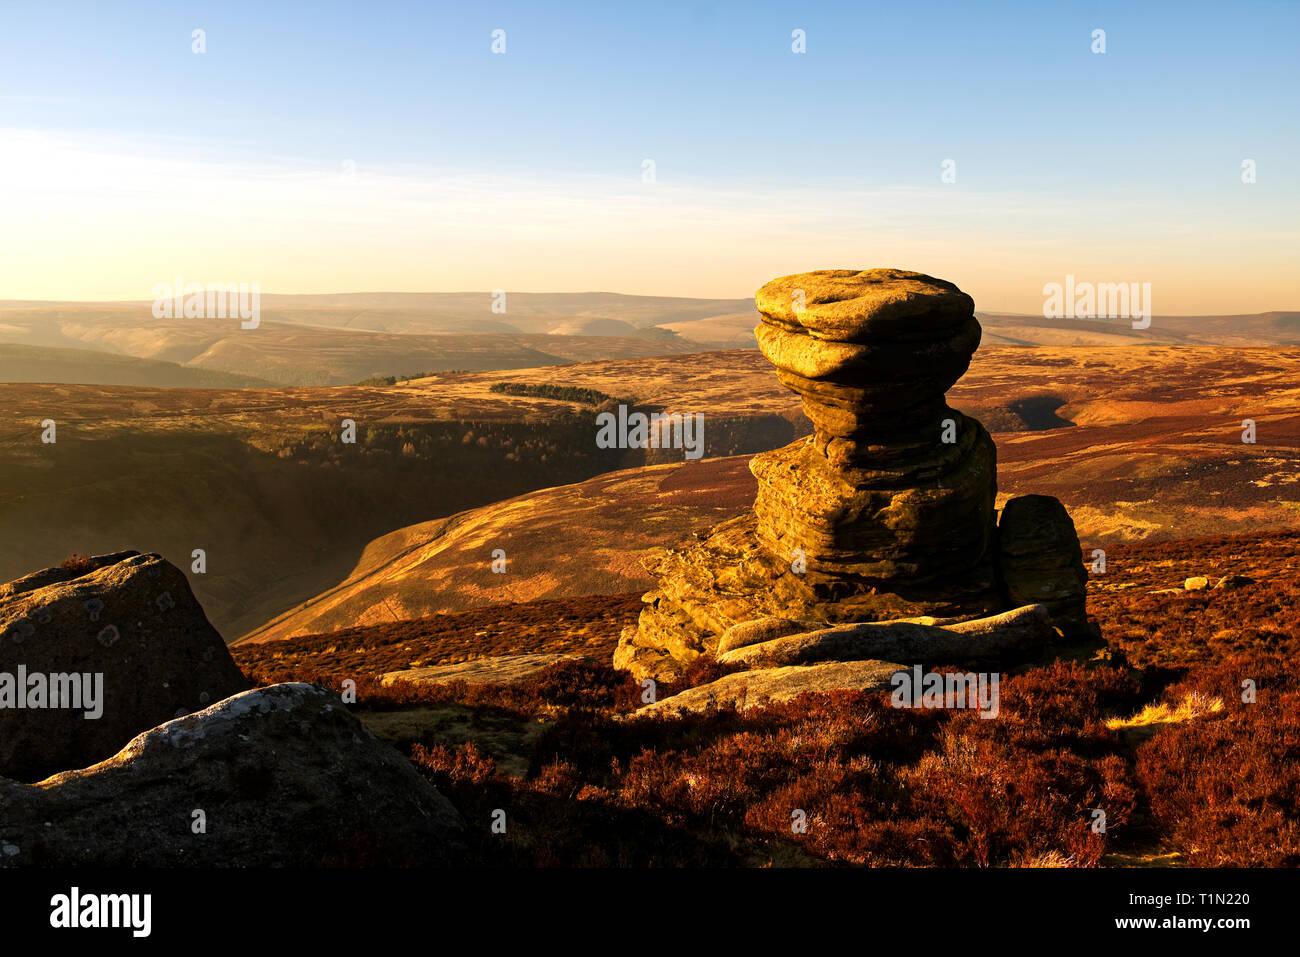 Sunset at Salt Cellar, a strange rock formation high up on Derwent Edge in the English Peak District, UK - Stock Image